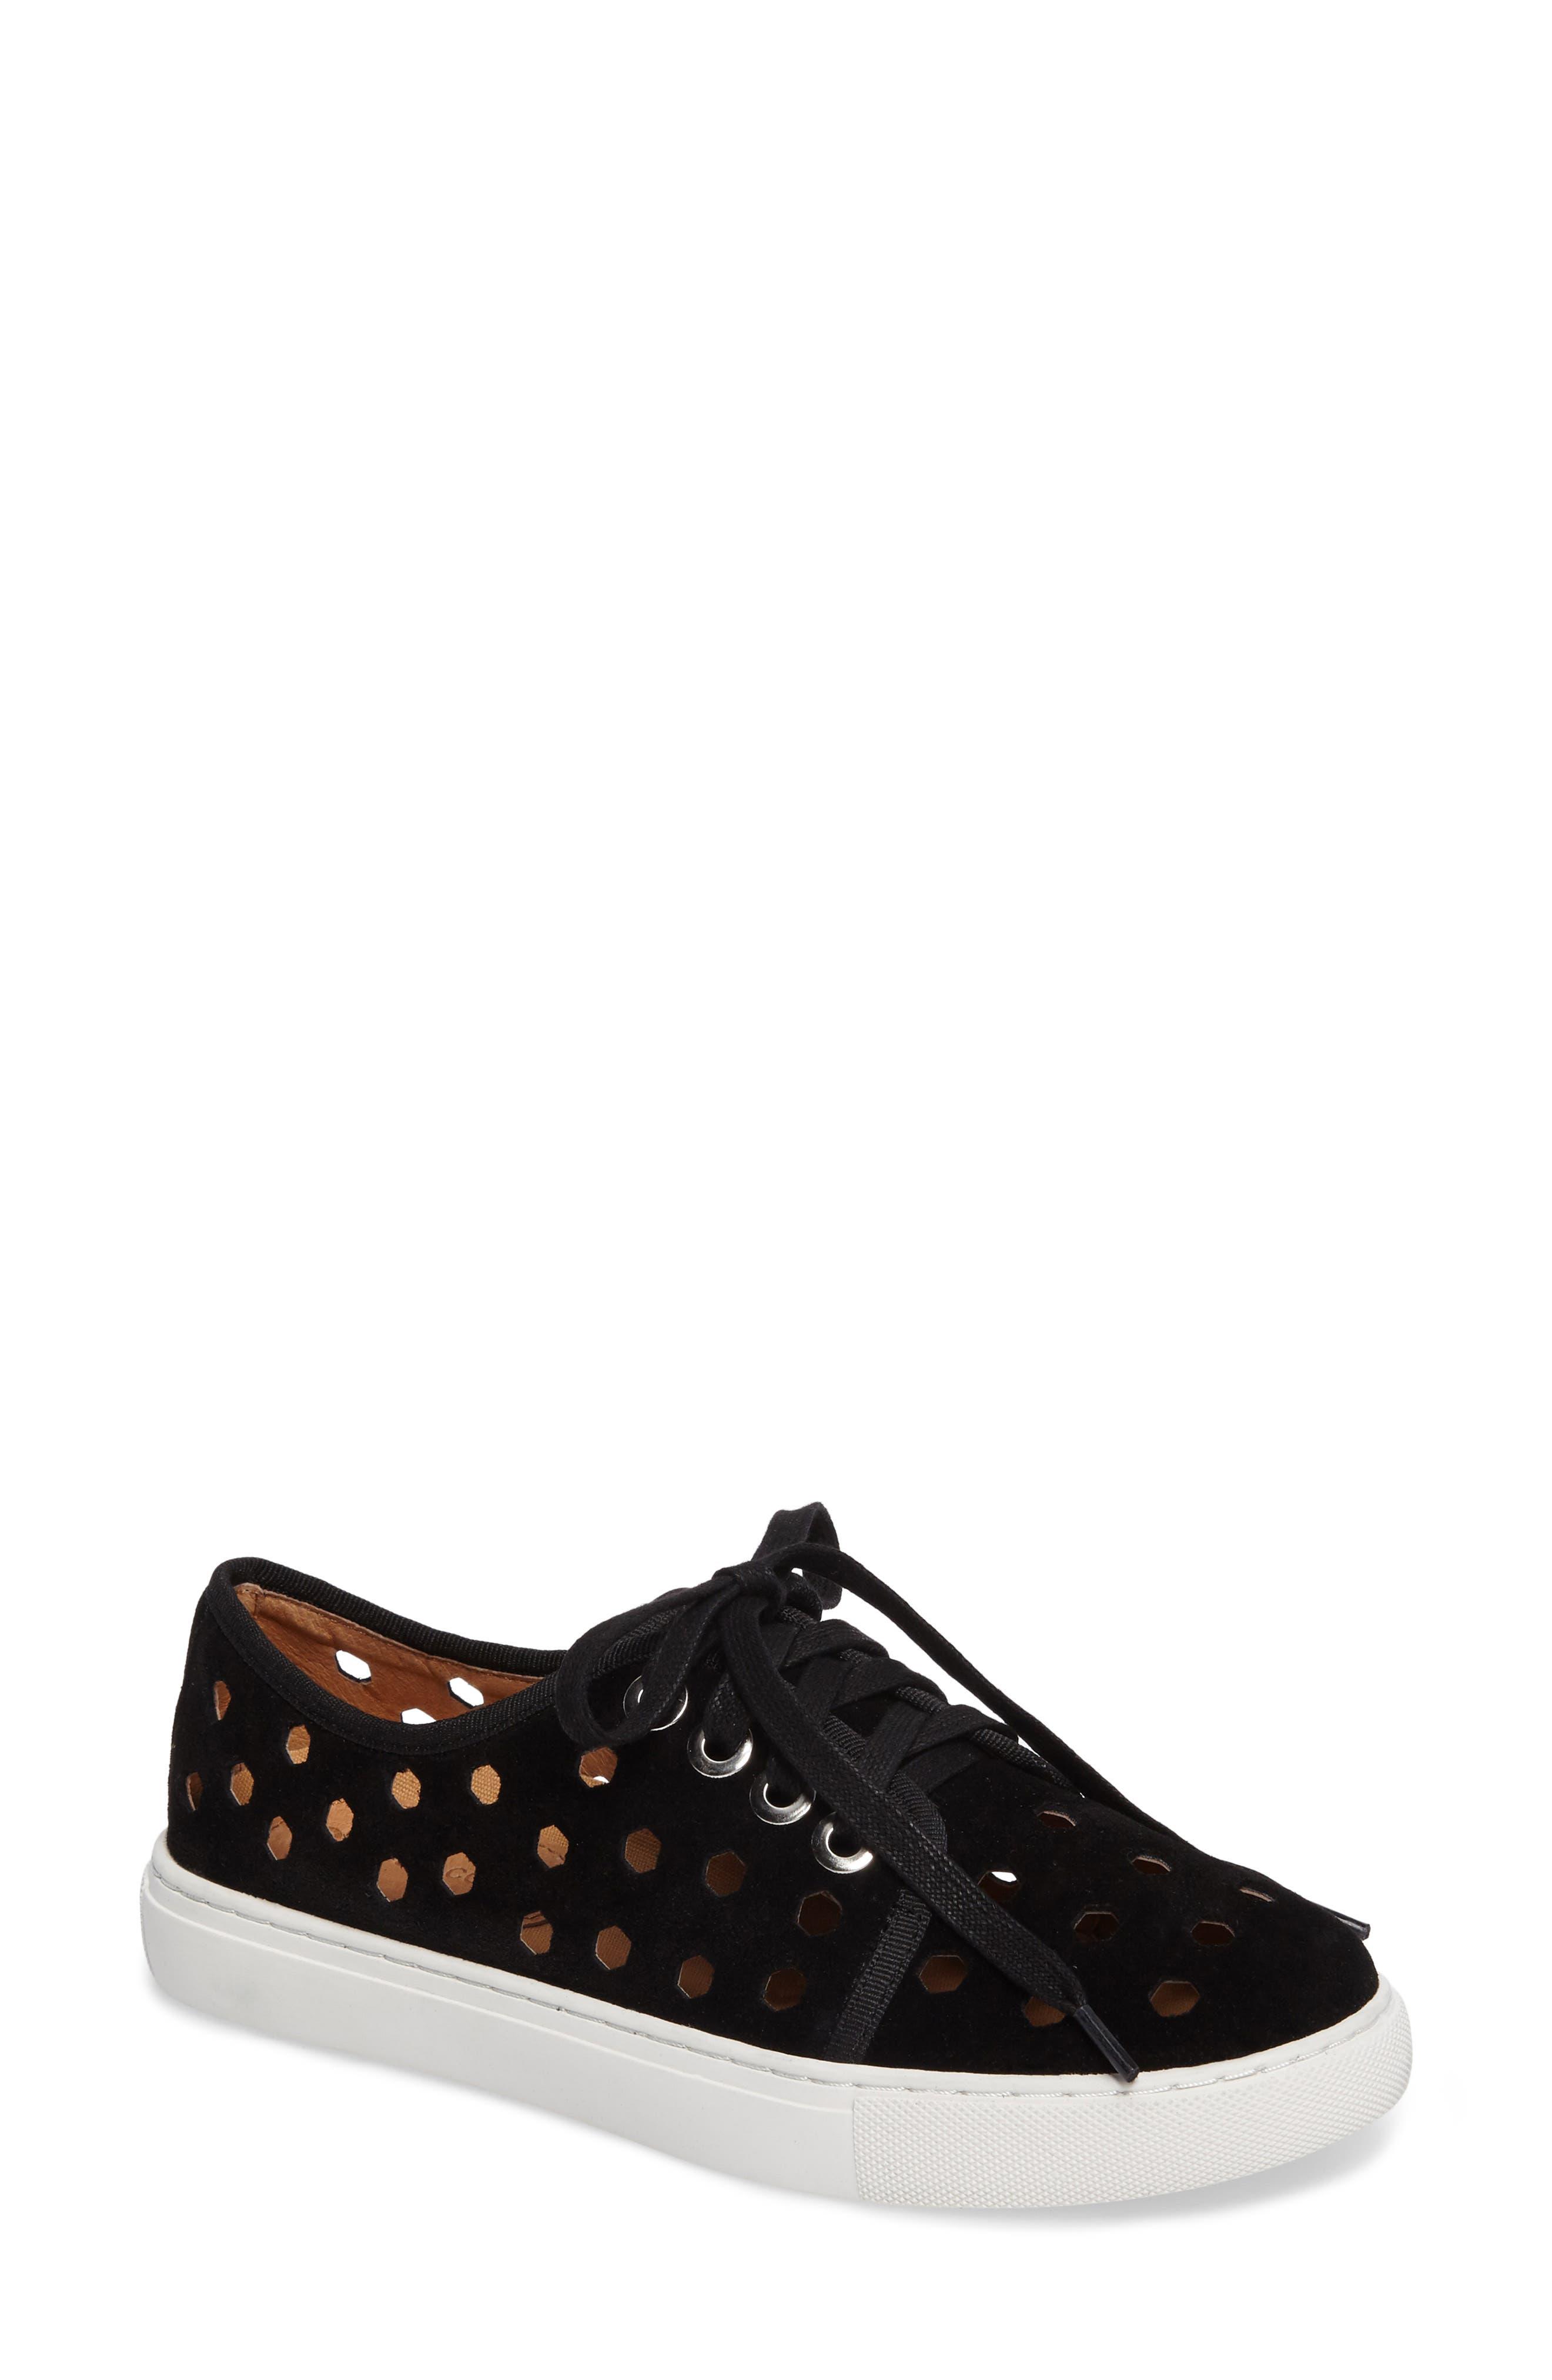 Alternate Image 1 Selected - Corso Como Rasta Perforated Sneaker (Women)